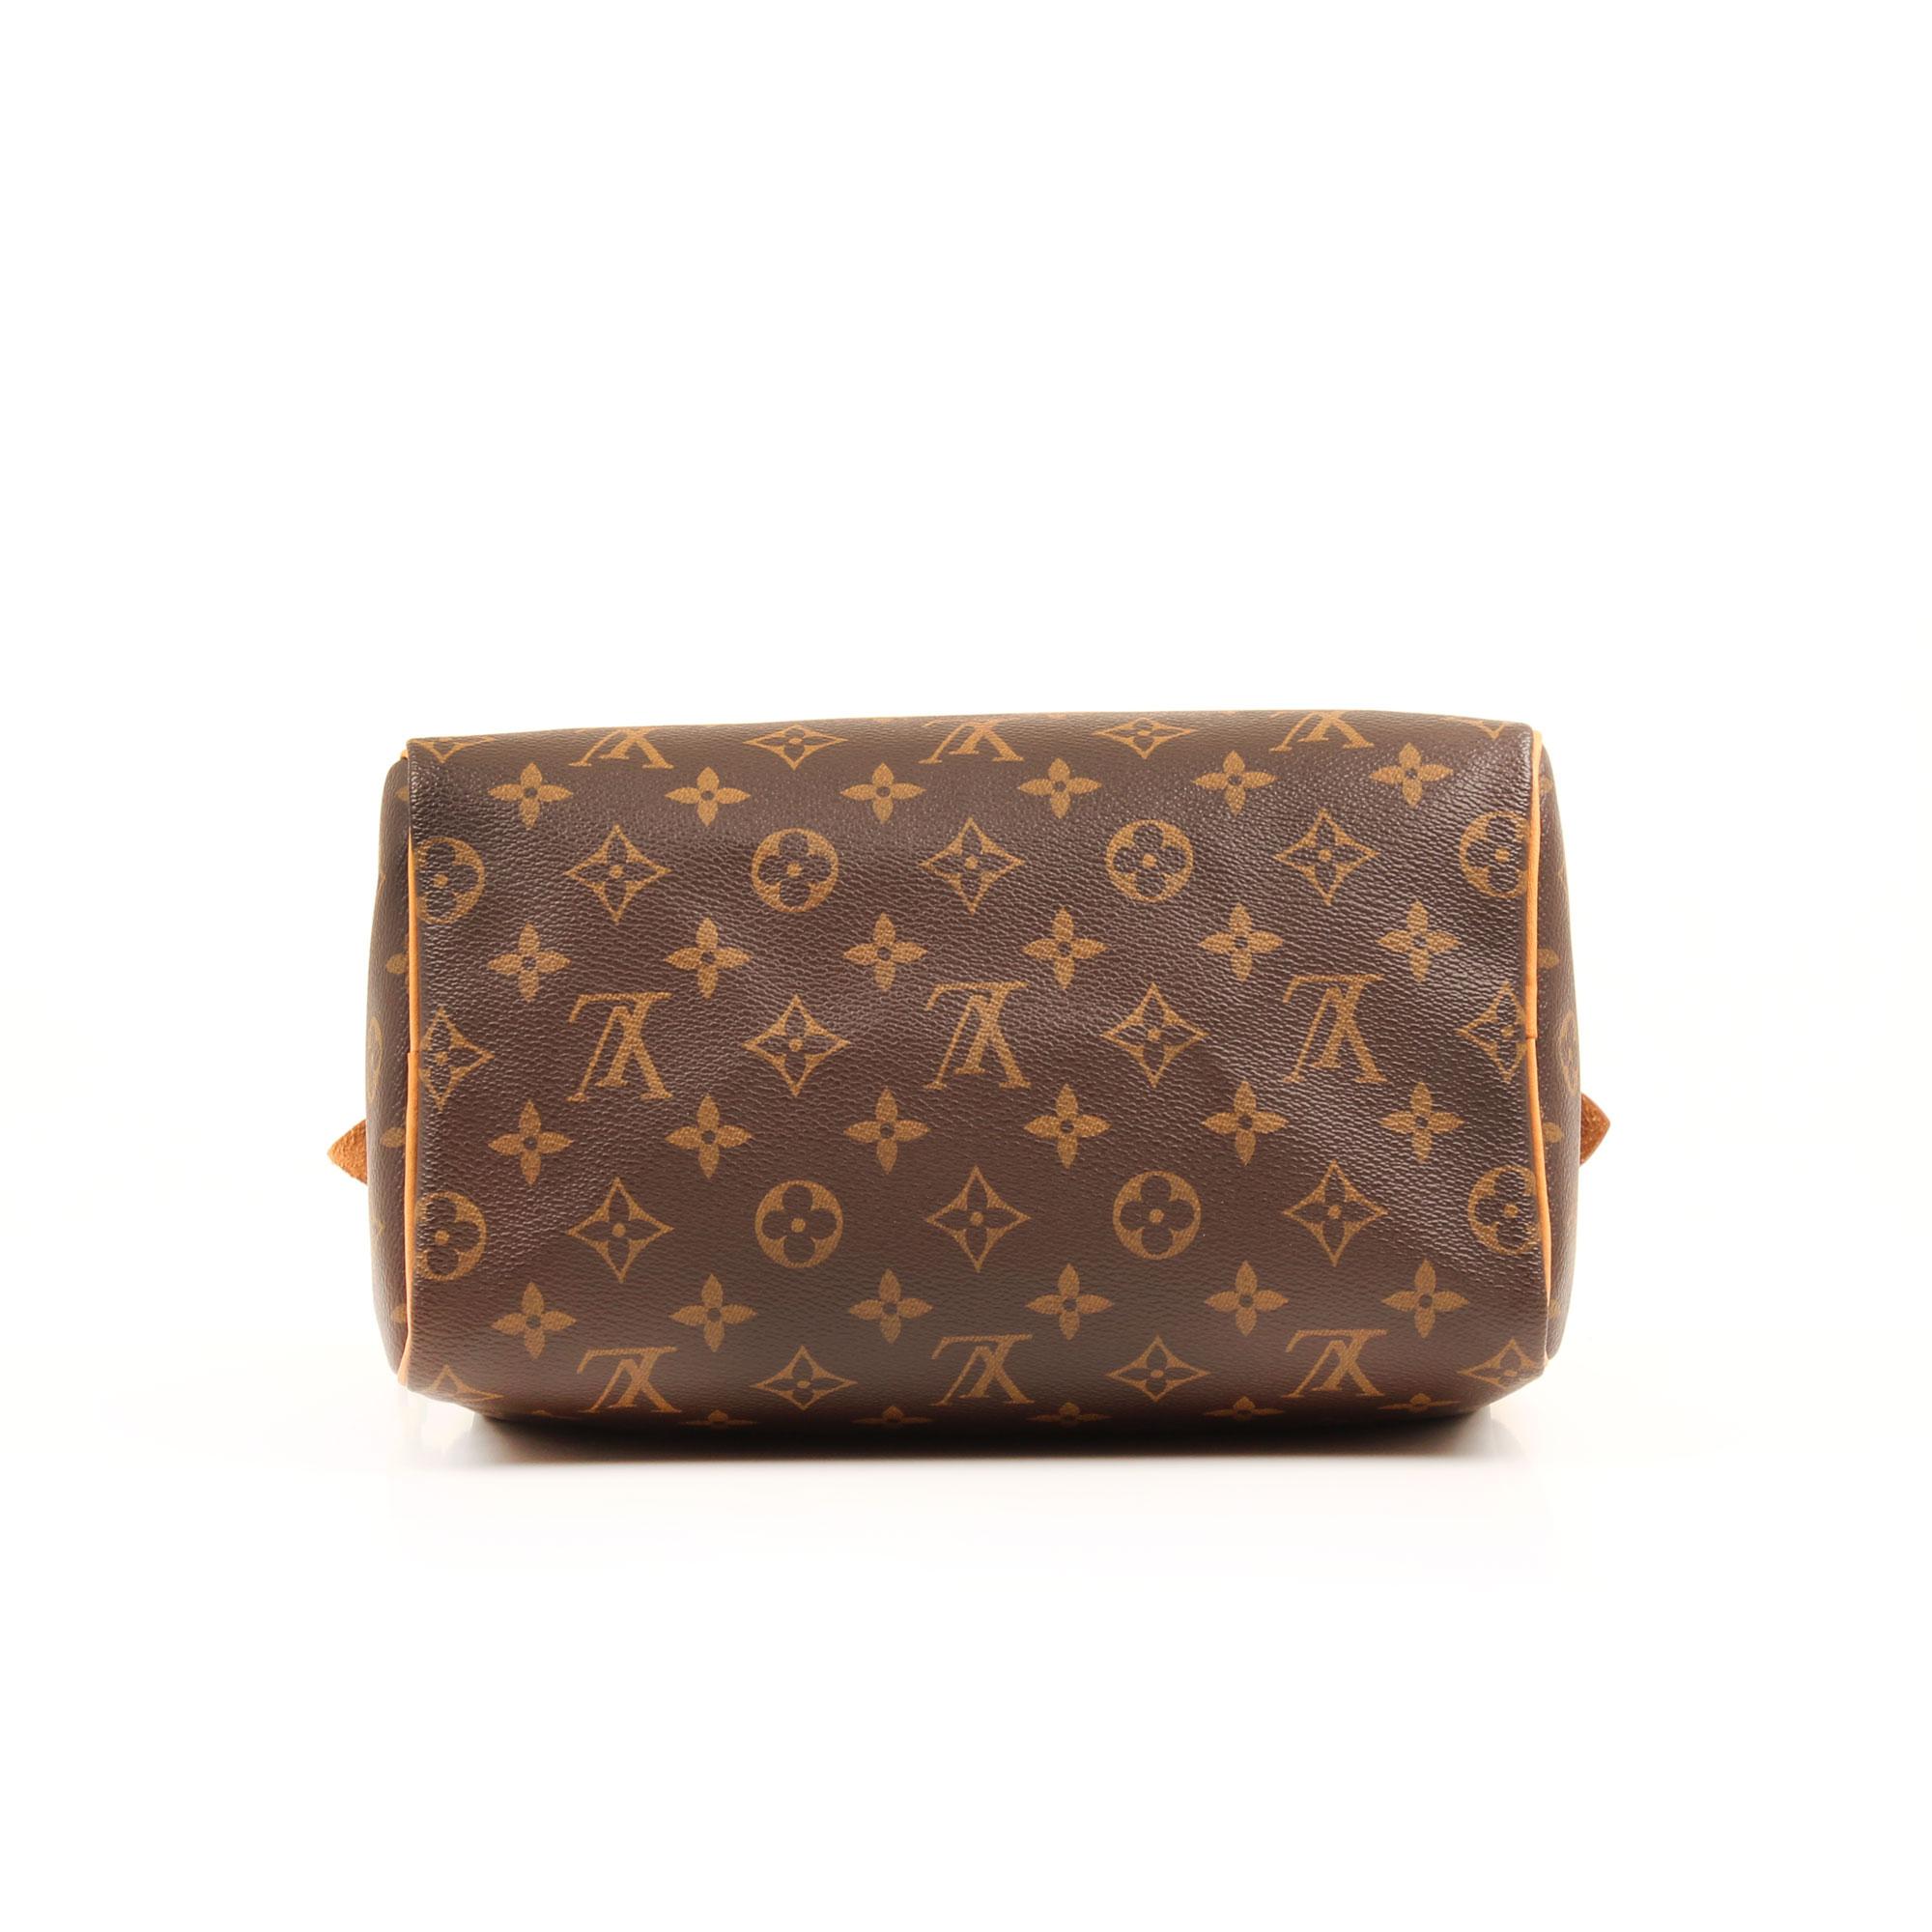 handbag louis vuitton speedy 25 monogram bottom